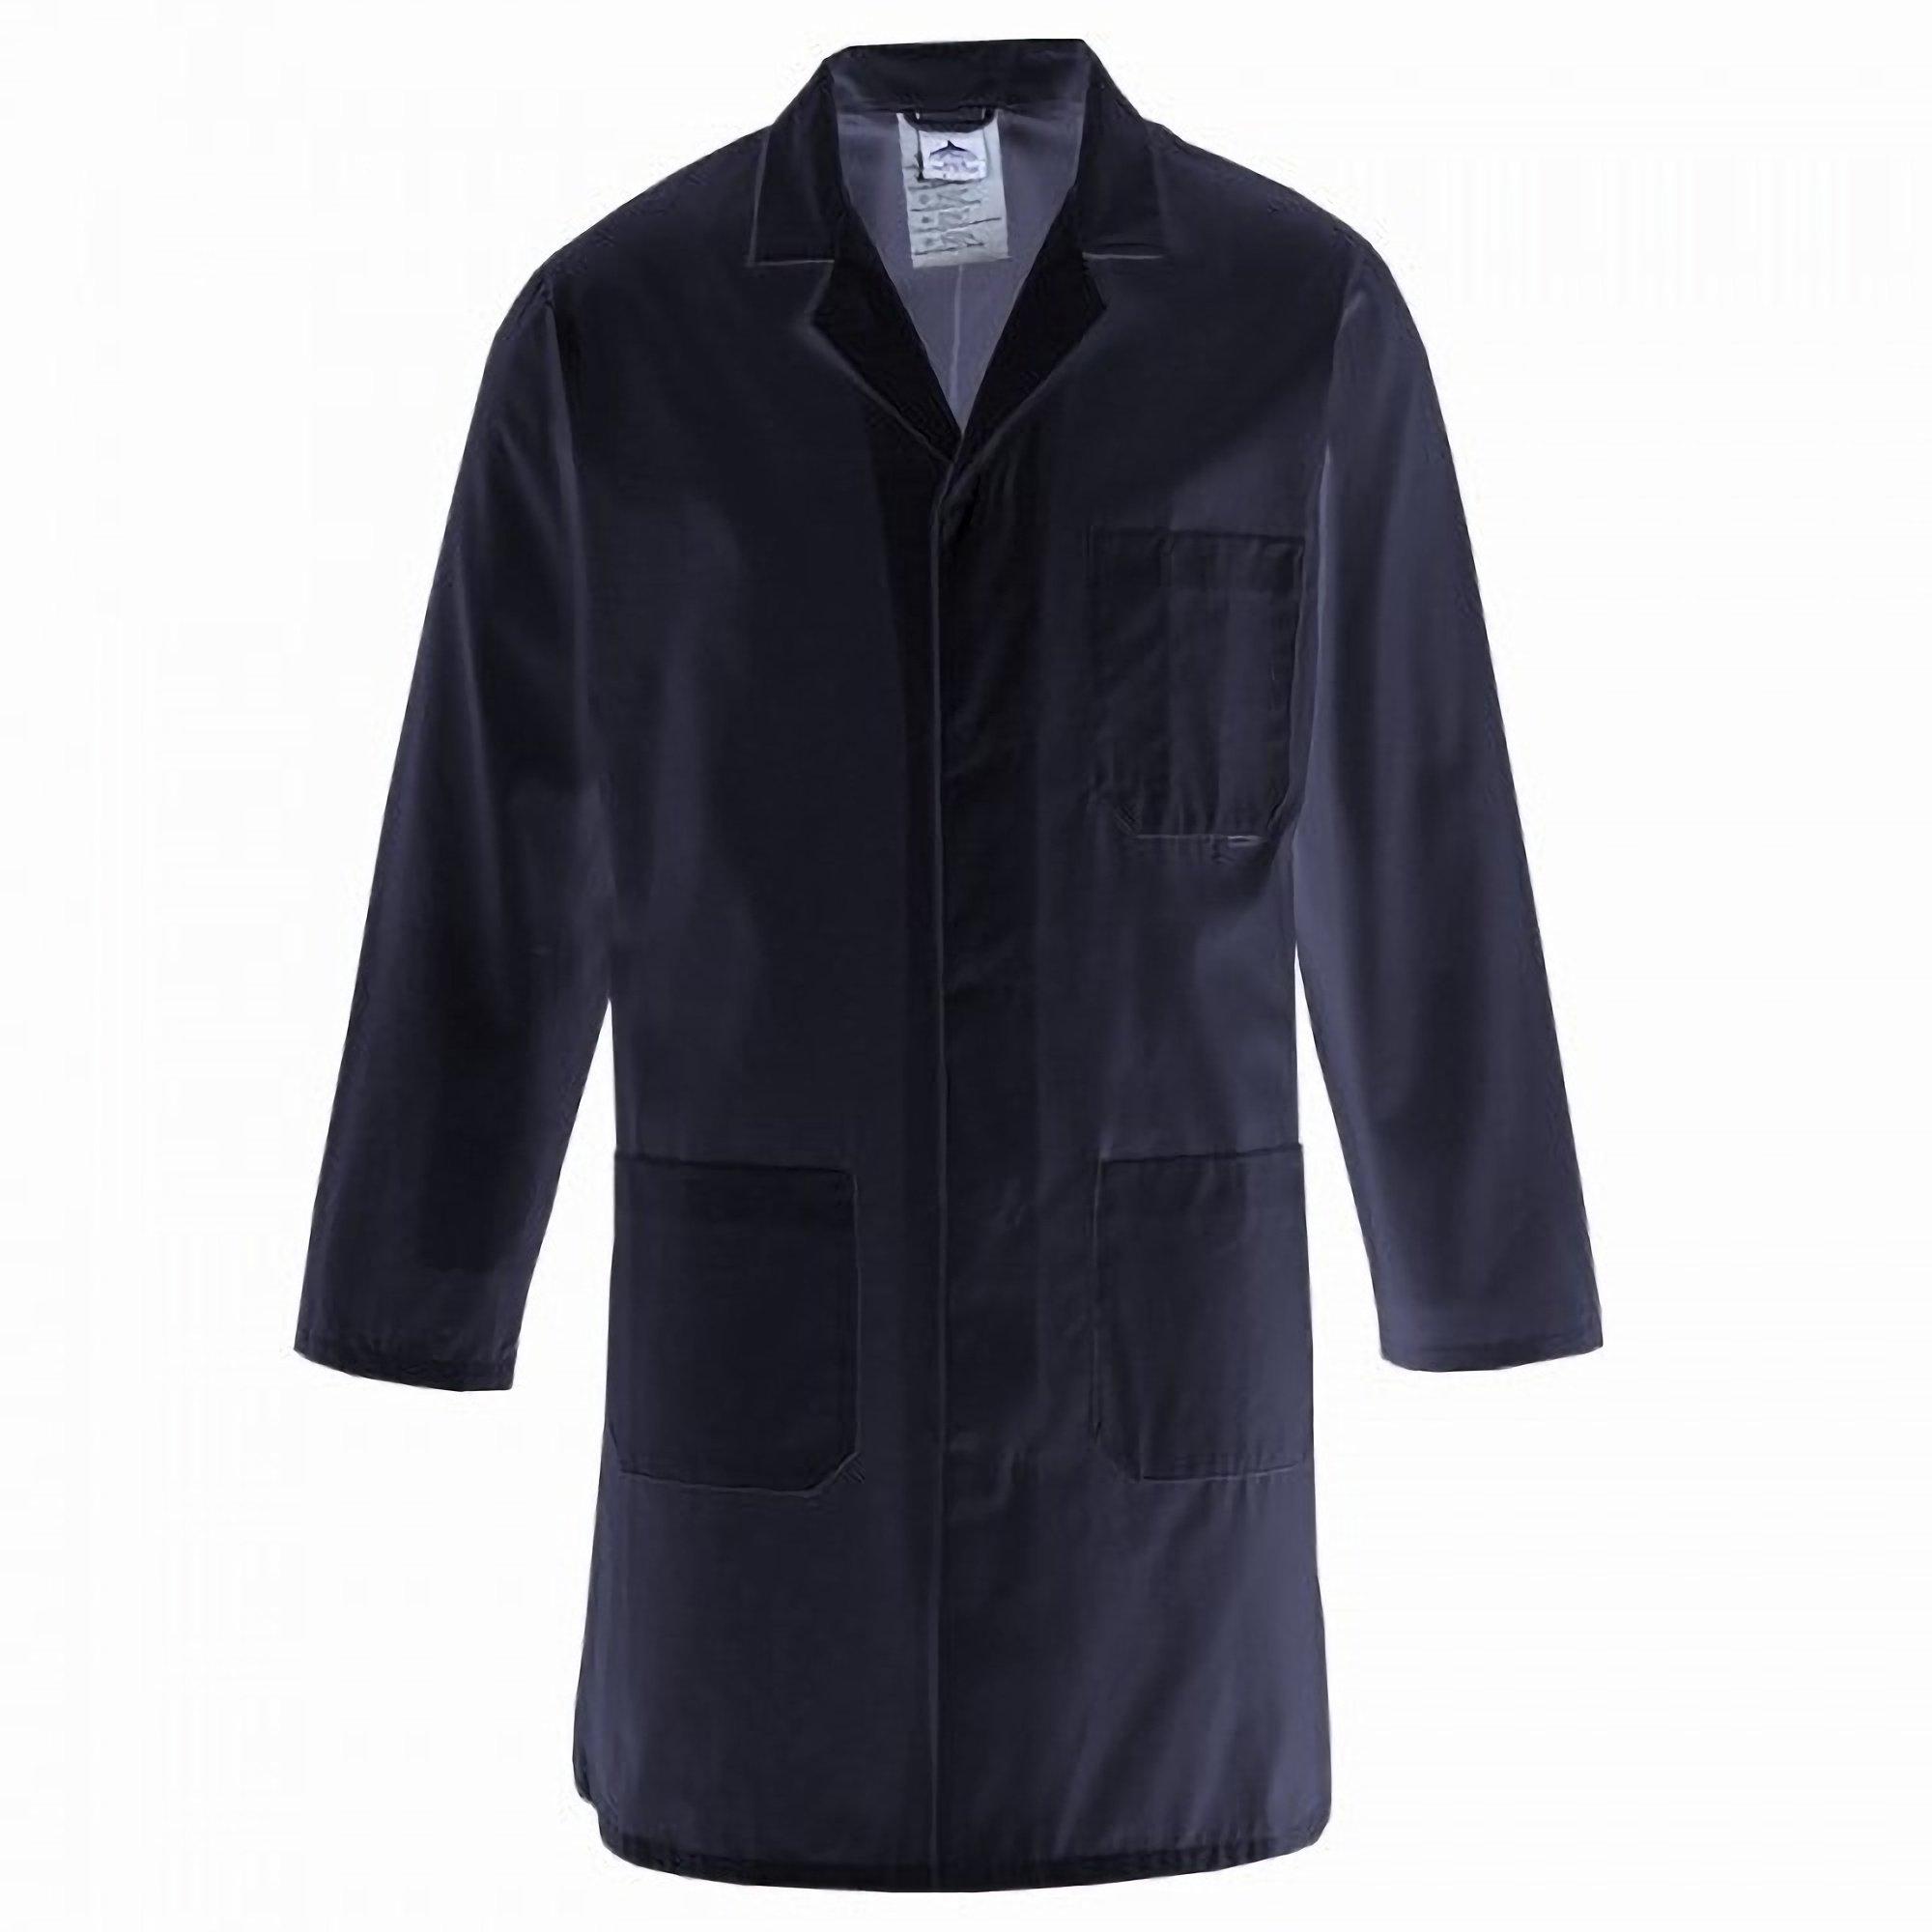 Portwest Standard Workwear Lab Coat (Medical Health) (3XL (54-55 Inch Chest)) (Navy)